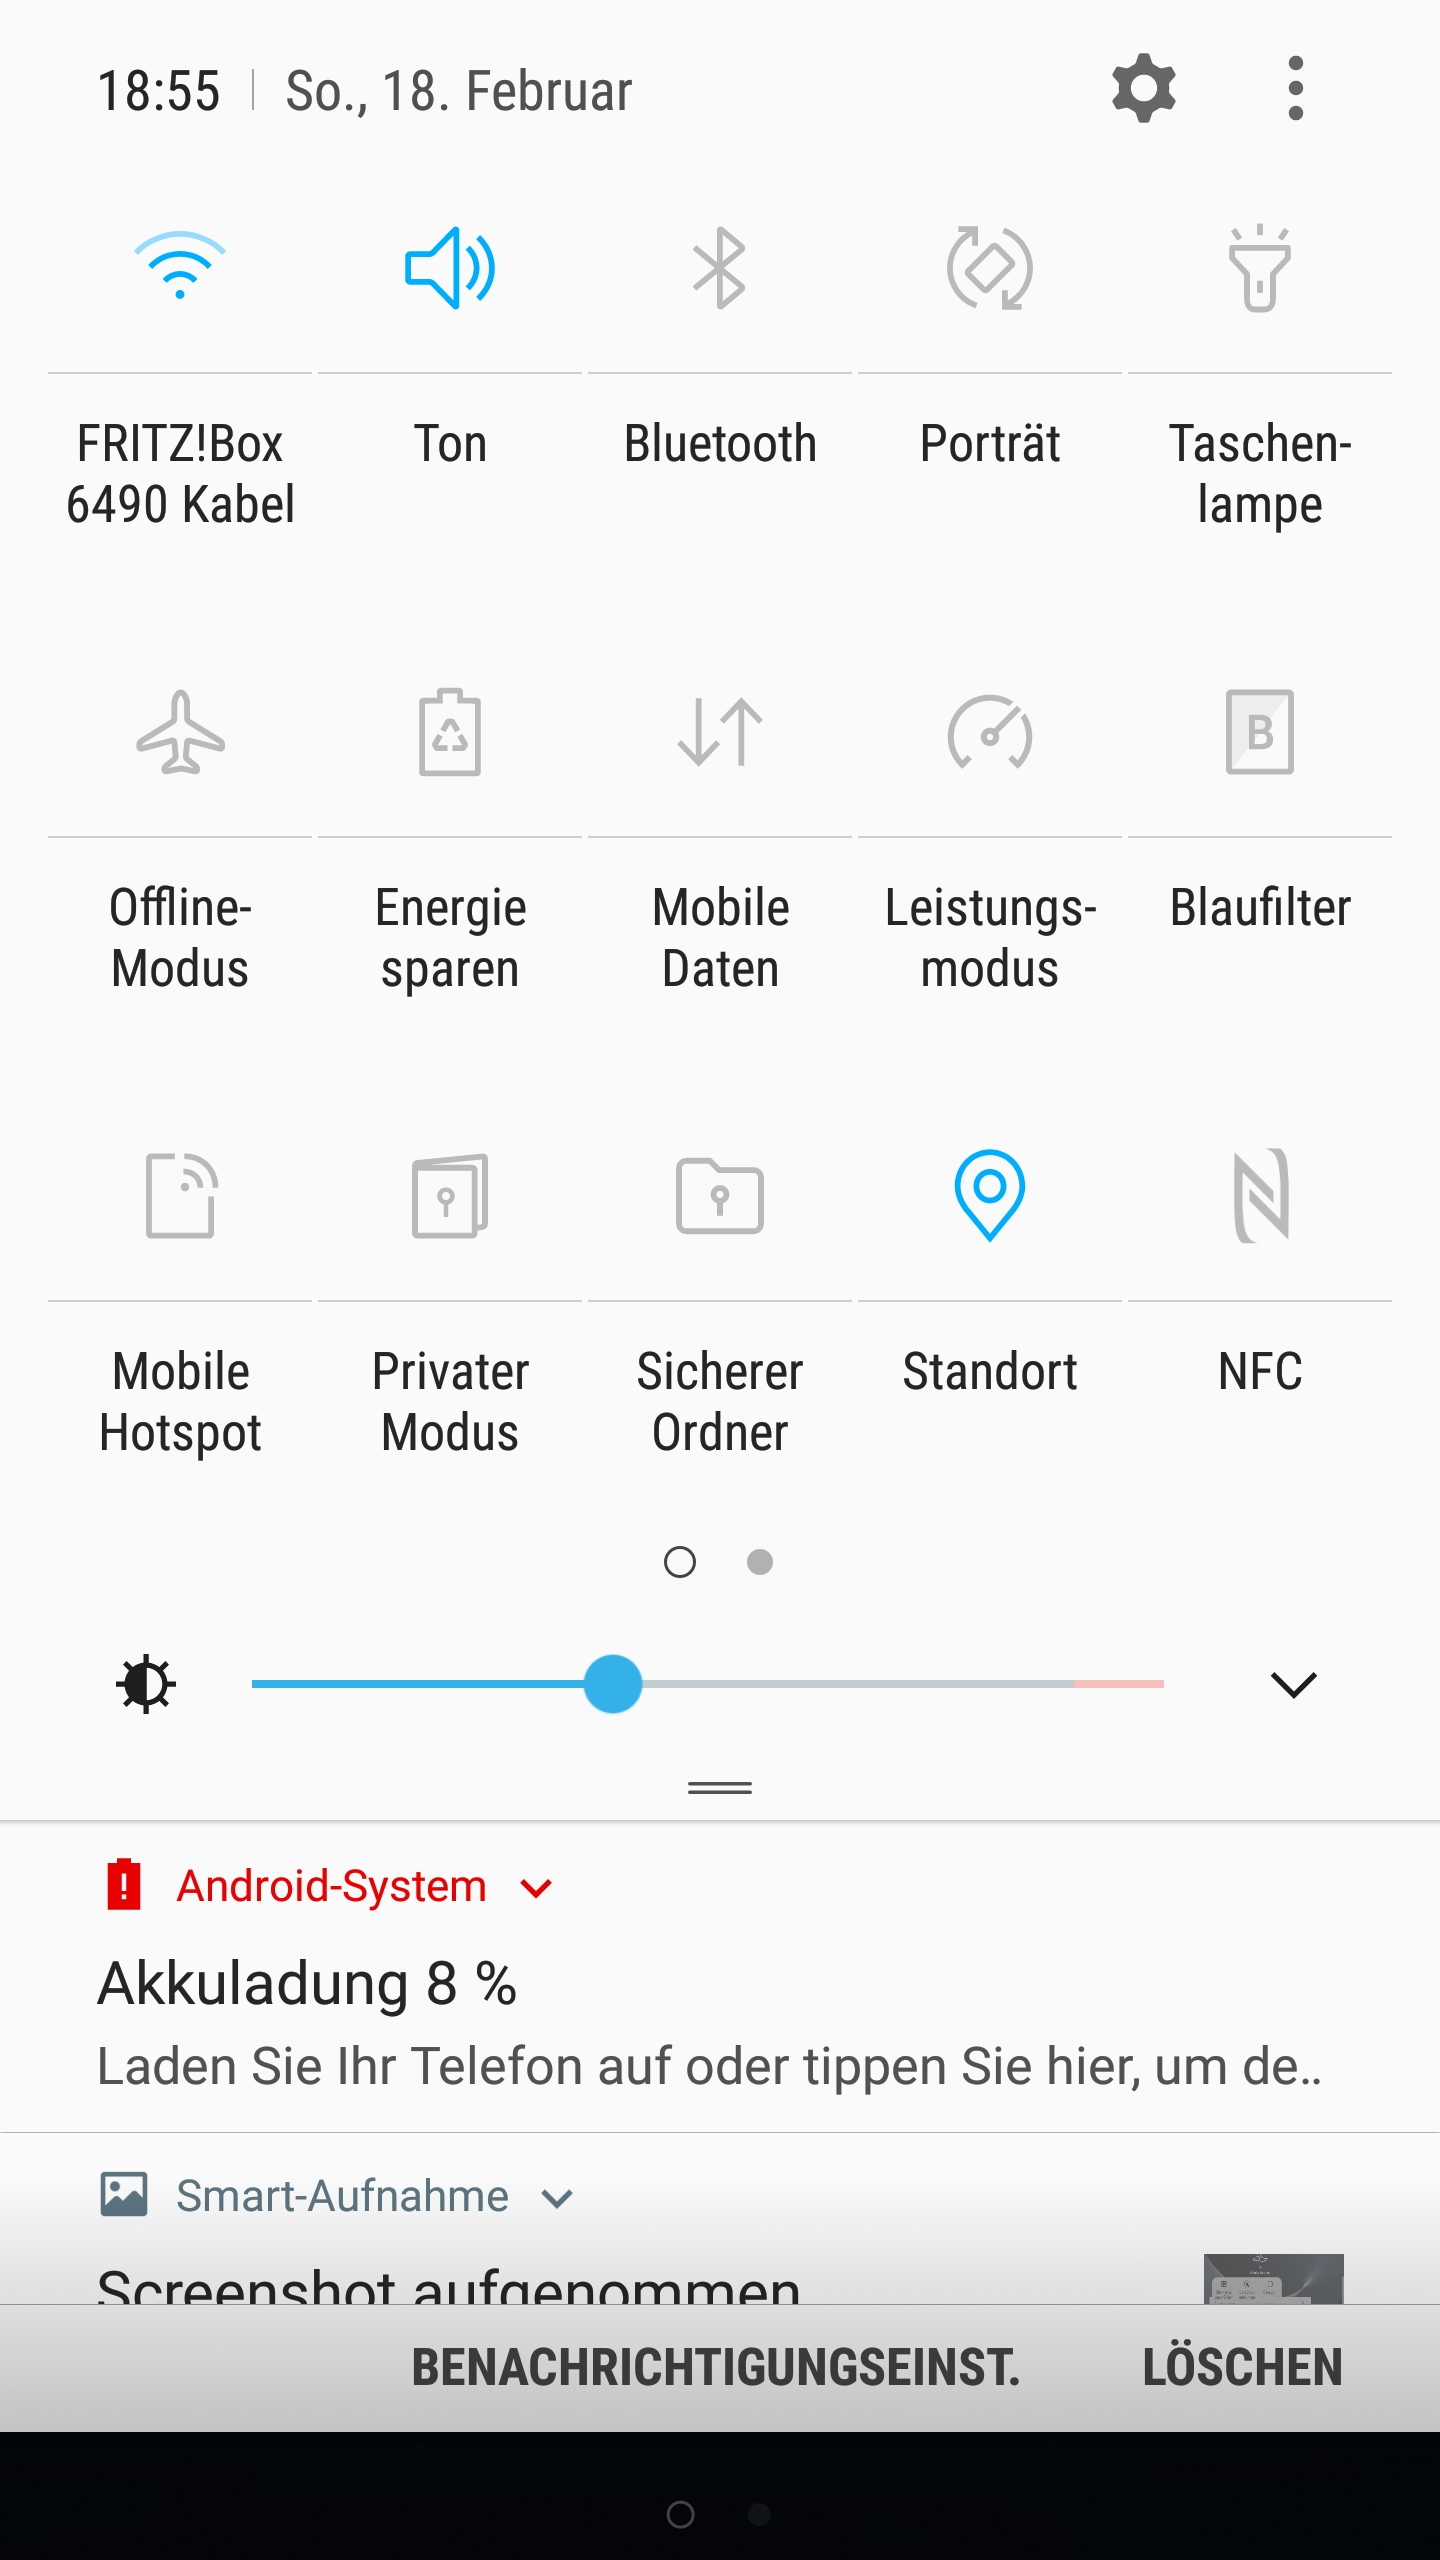 Custom Rom: Android 8 0 Oreo Port auf dem Galaxy S7 edge